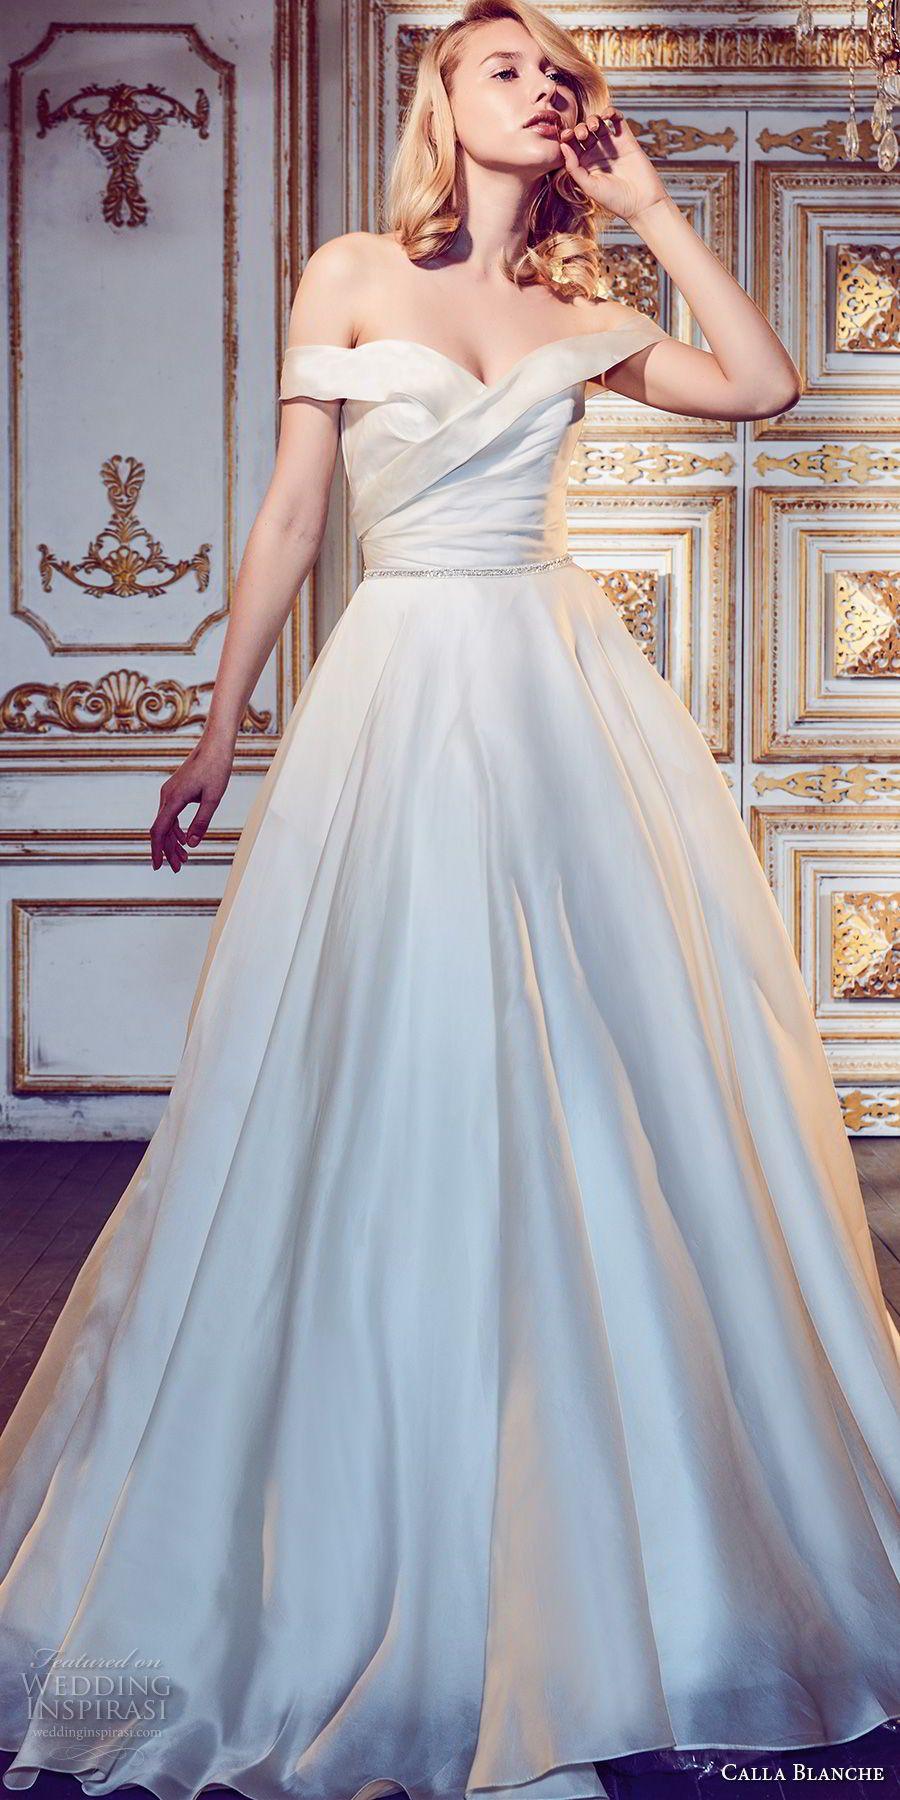 Calla Blanche Fall 2017 Wedding Dresses | Bodice, Wedding dress and ...